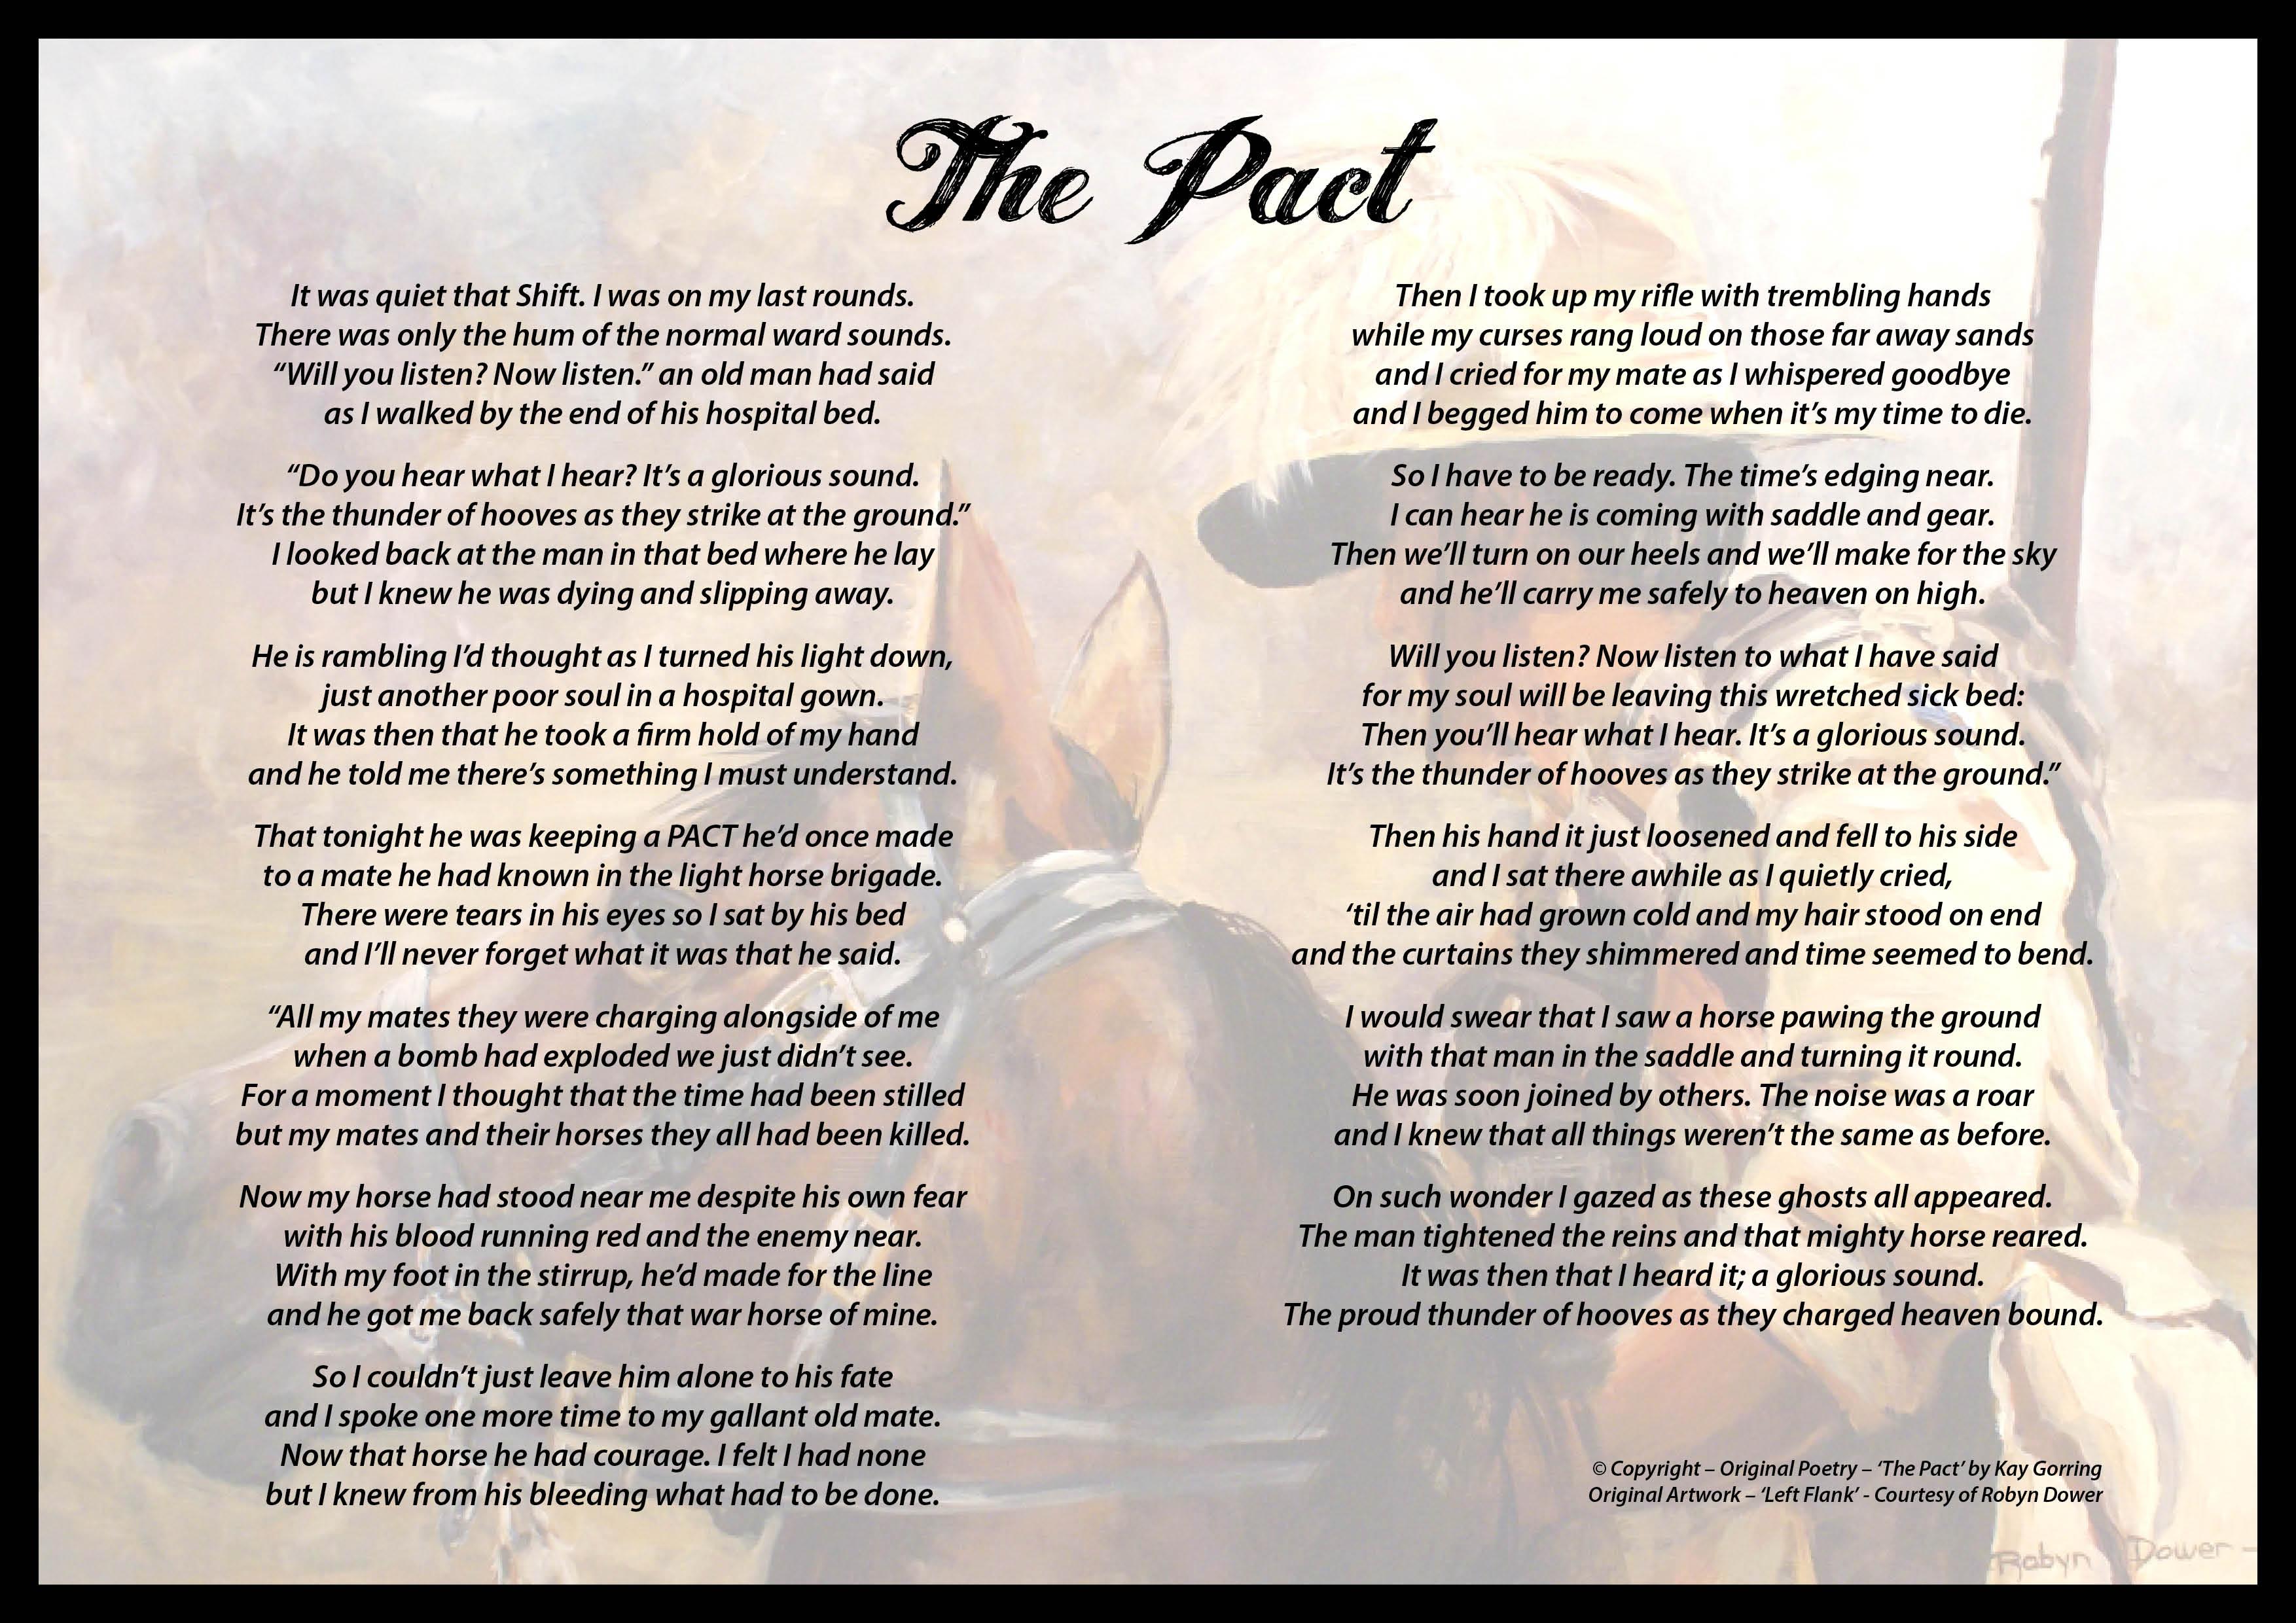 The Pact | Kay Gorring